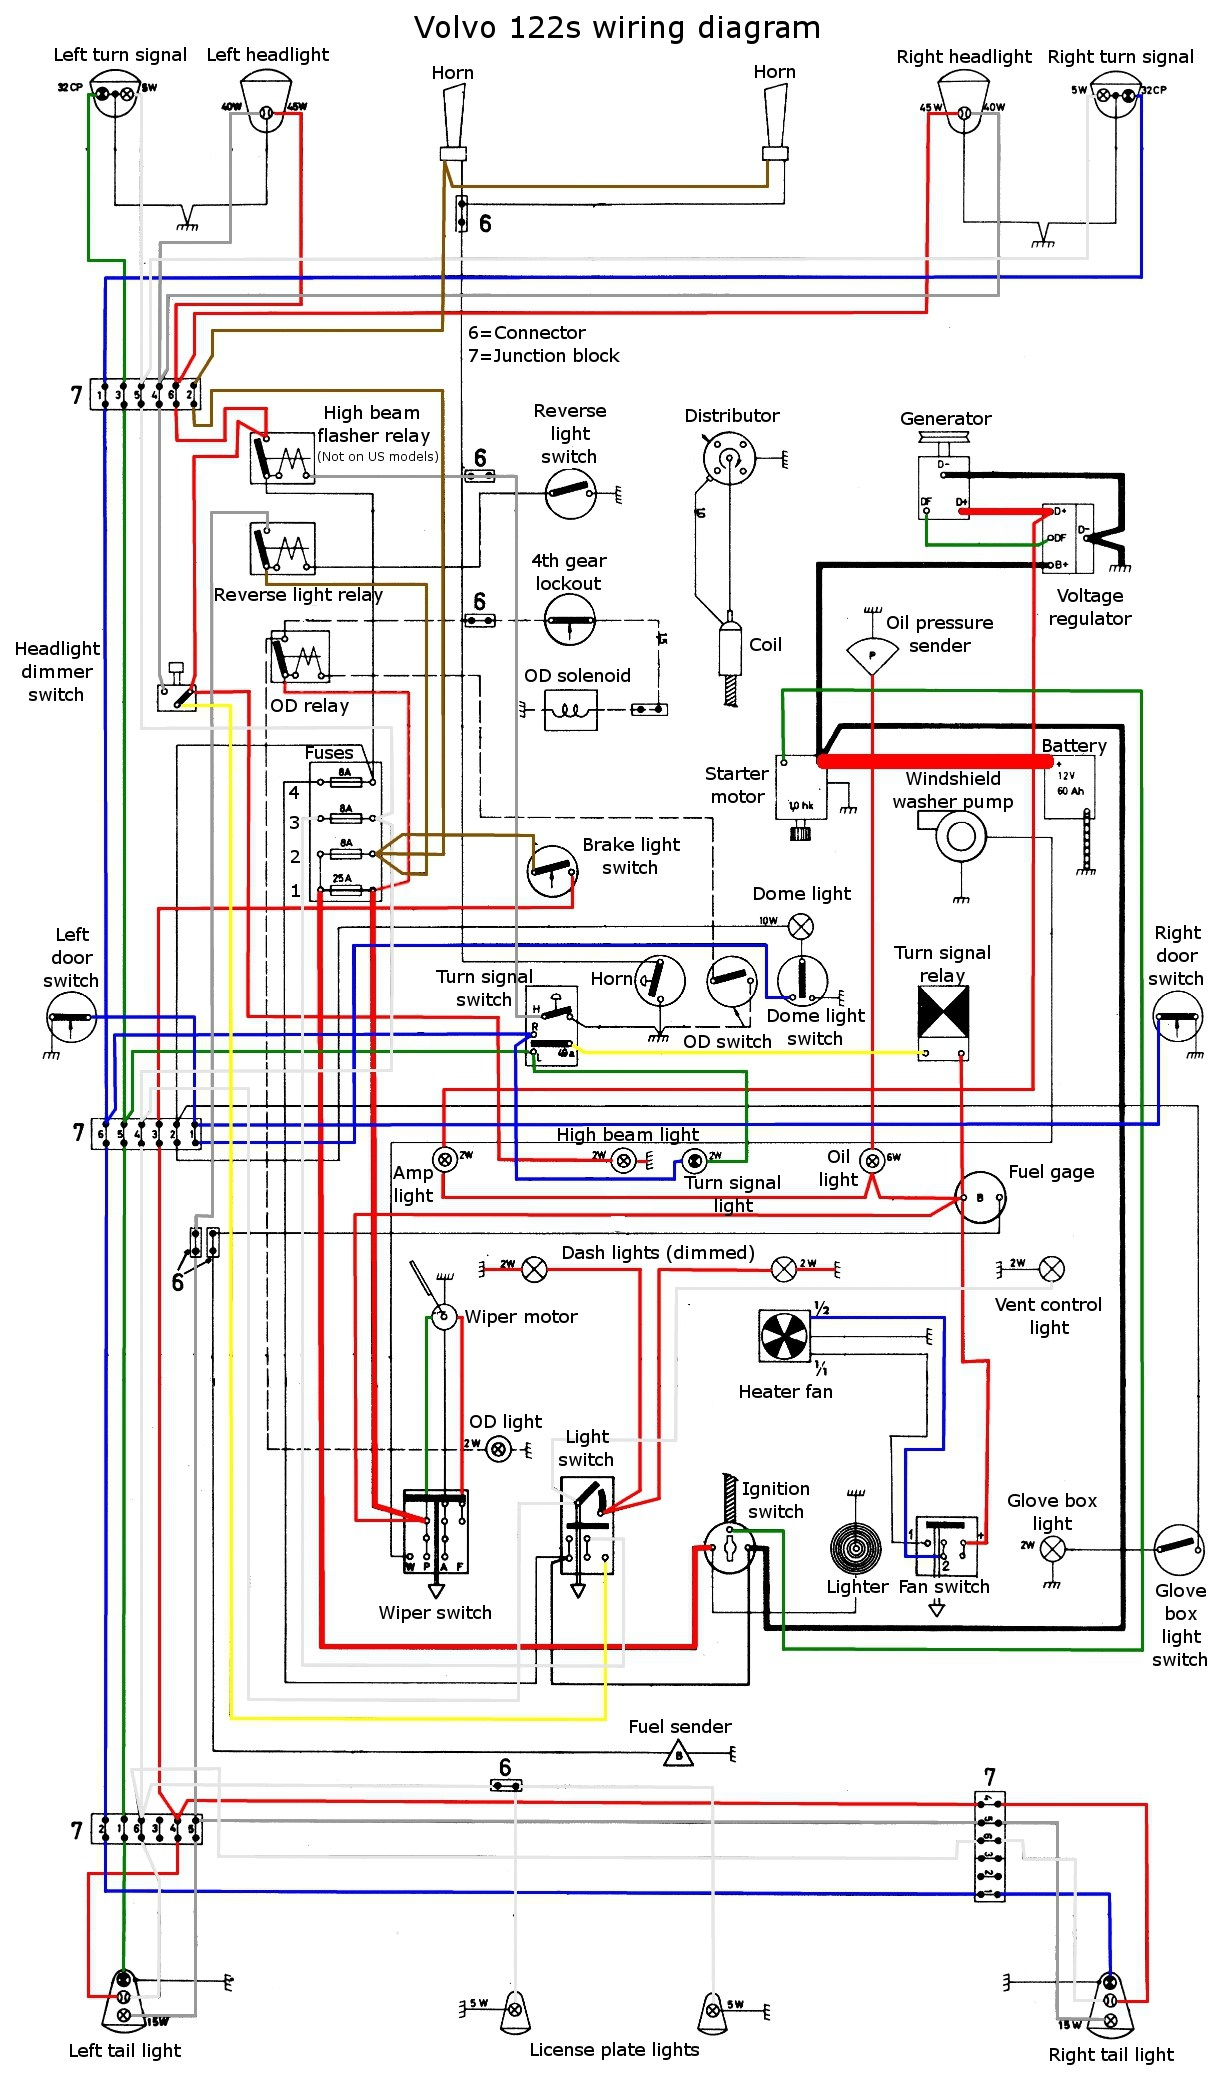 GA_7025] Wiring Diagram Further Volvo Wiring Diagrams On Volvo 850 T5 Wiring  Wiring DiagramAriot Crove Heeve Mohammedshrine Librar Wiring 101